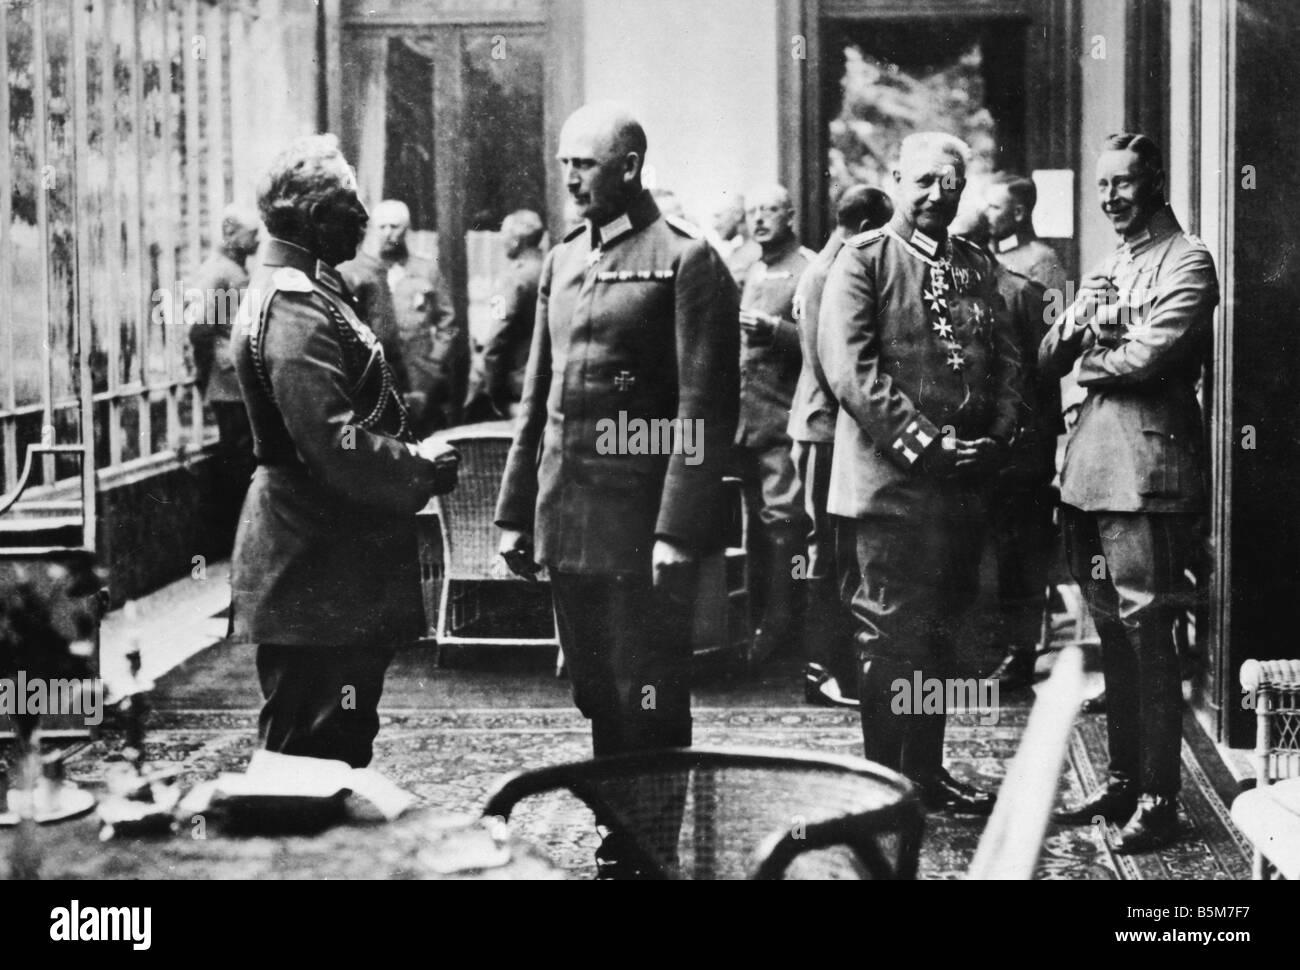 1 W46 F1918 1 Wilhelm II 30 years government 1918 Wilhelm II German Kaiser 1888 1918 1859 1941 Celebrating the Kaiser - Stock Image